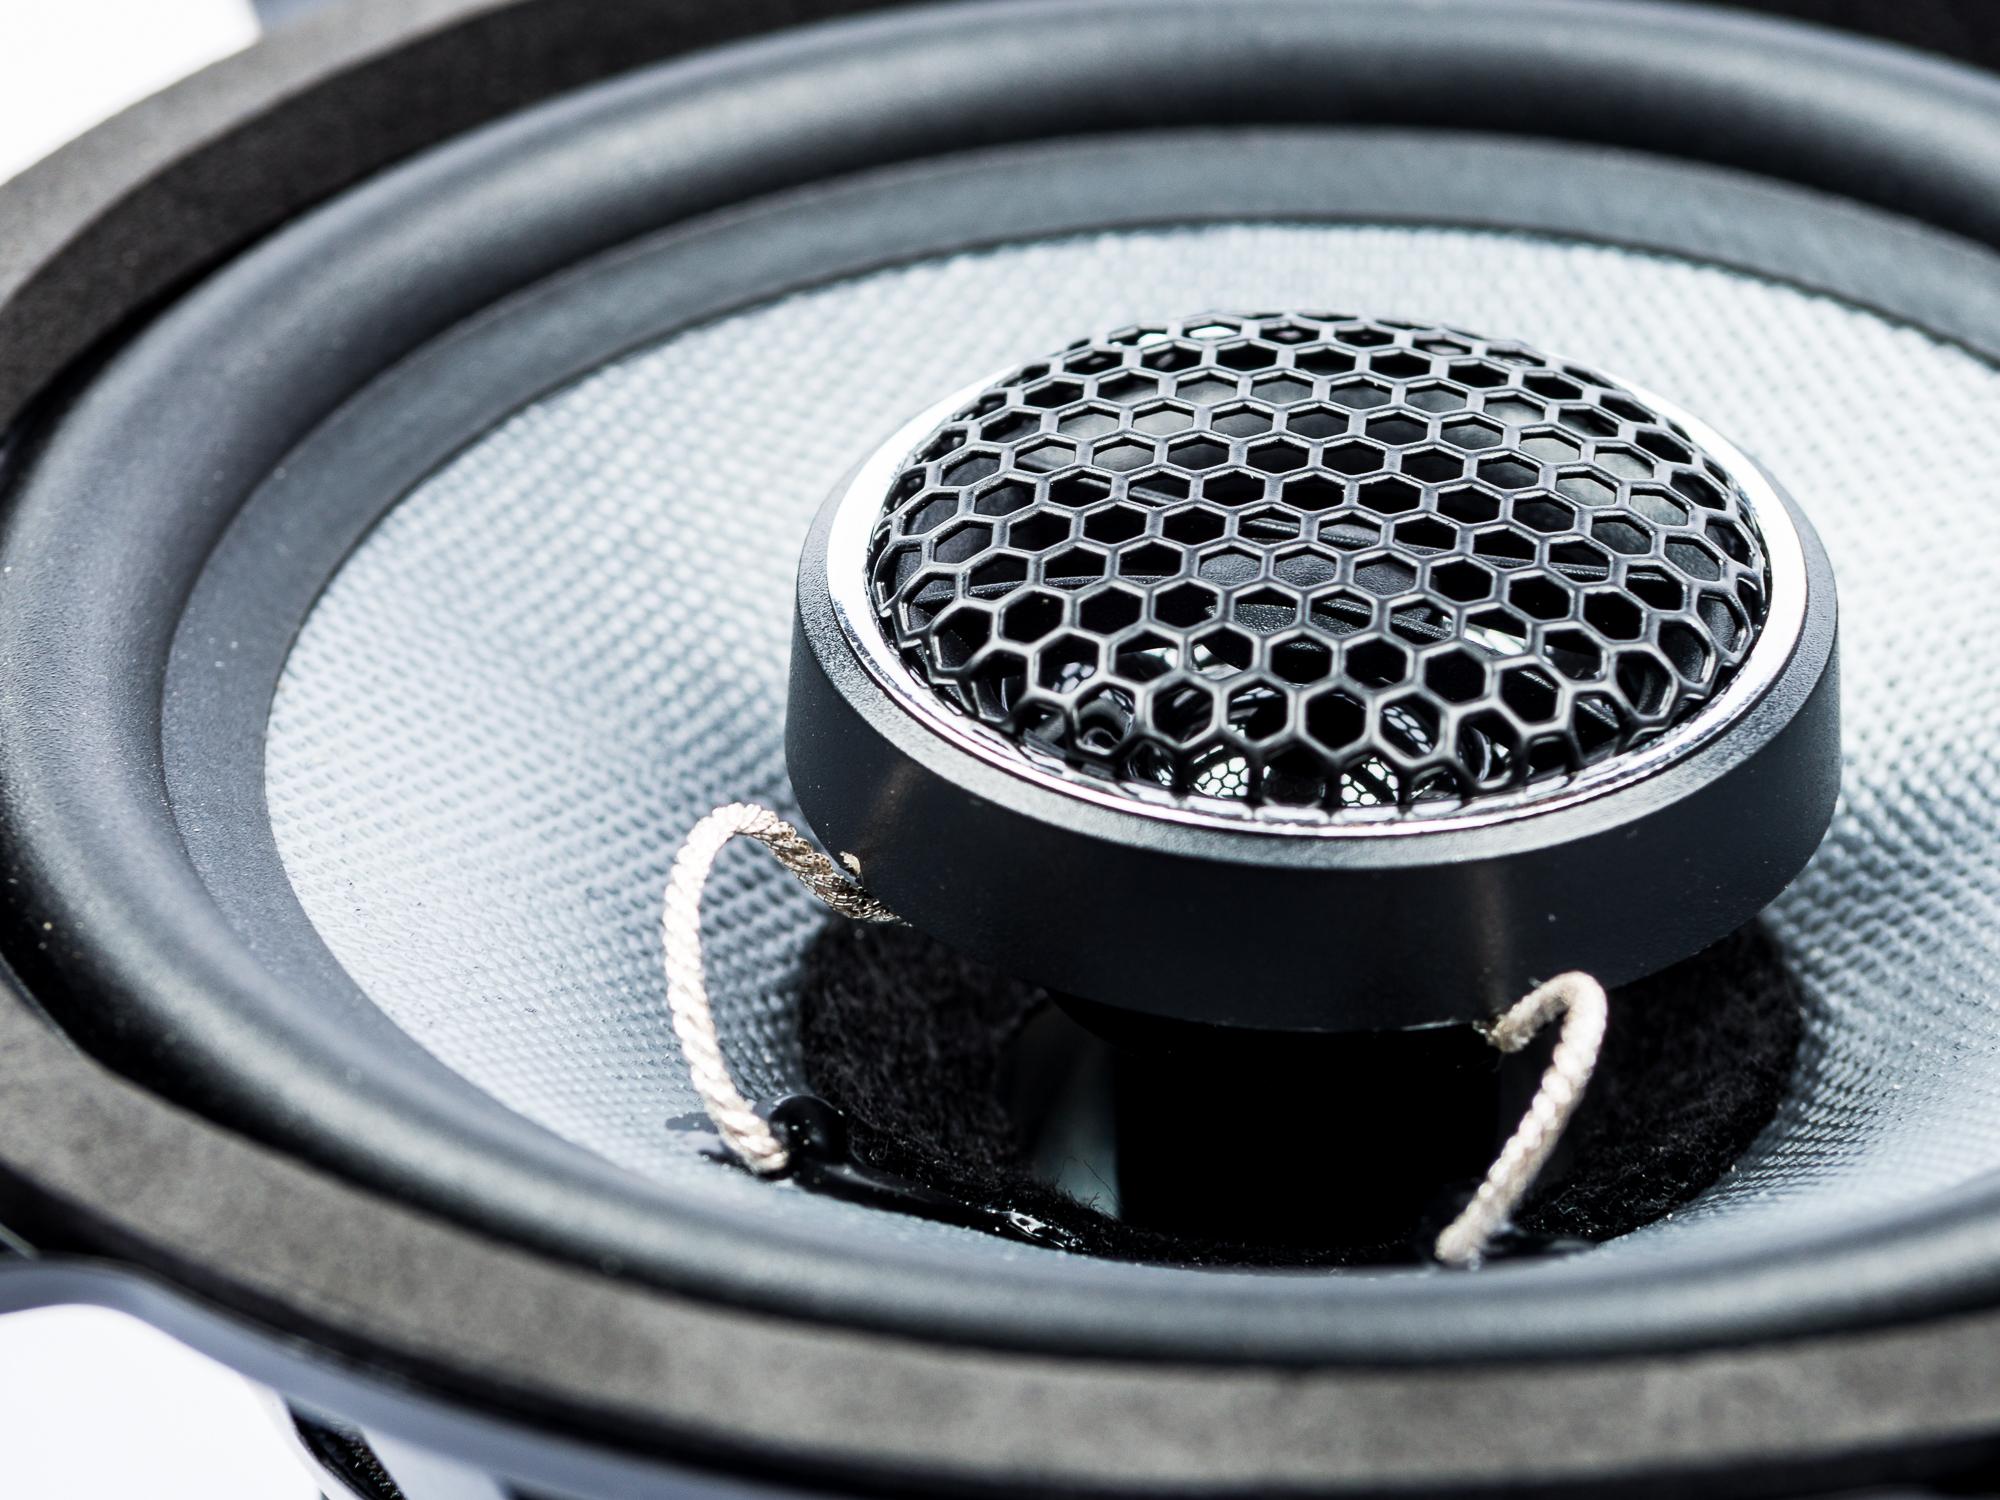 PG Audio EVO III 13.2, 13 cm Coaxial Lautsprecher passend für Chevrolet, Daihatsu, Honda, Mazda & Nissan – Bild 4